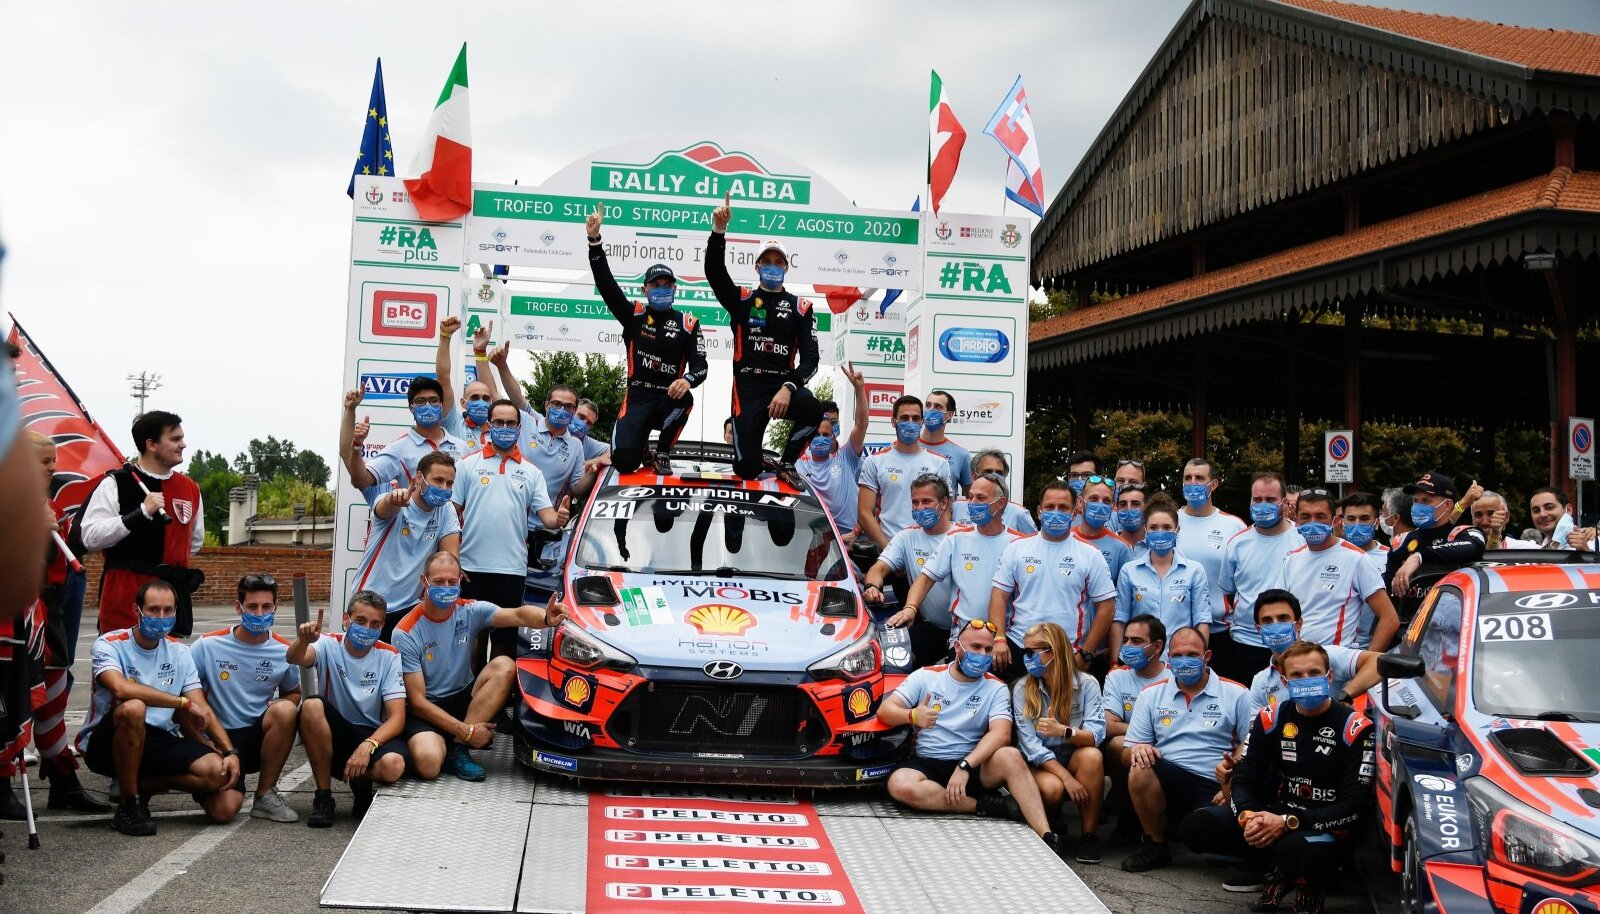 Thierry Neuville ja Hyundai meeskond 2020. aasta Rally di Alba poodiumil.